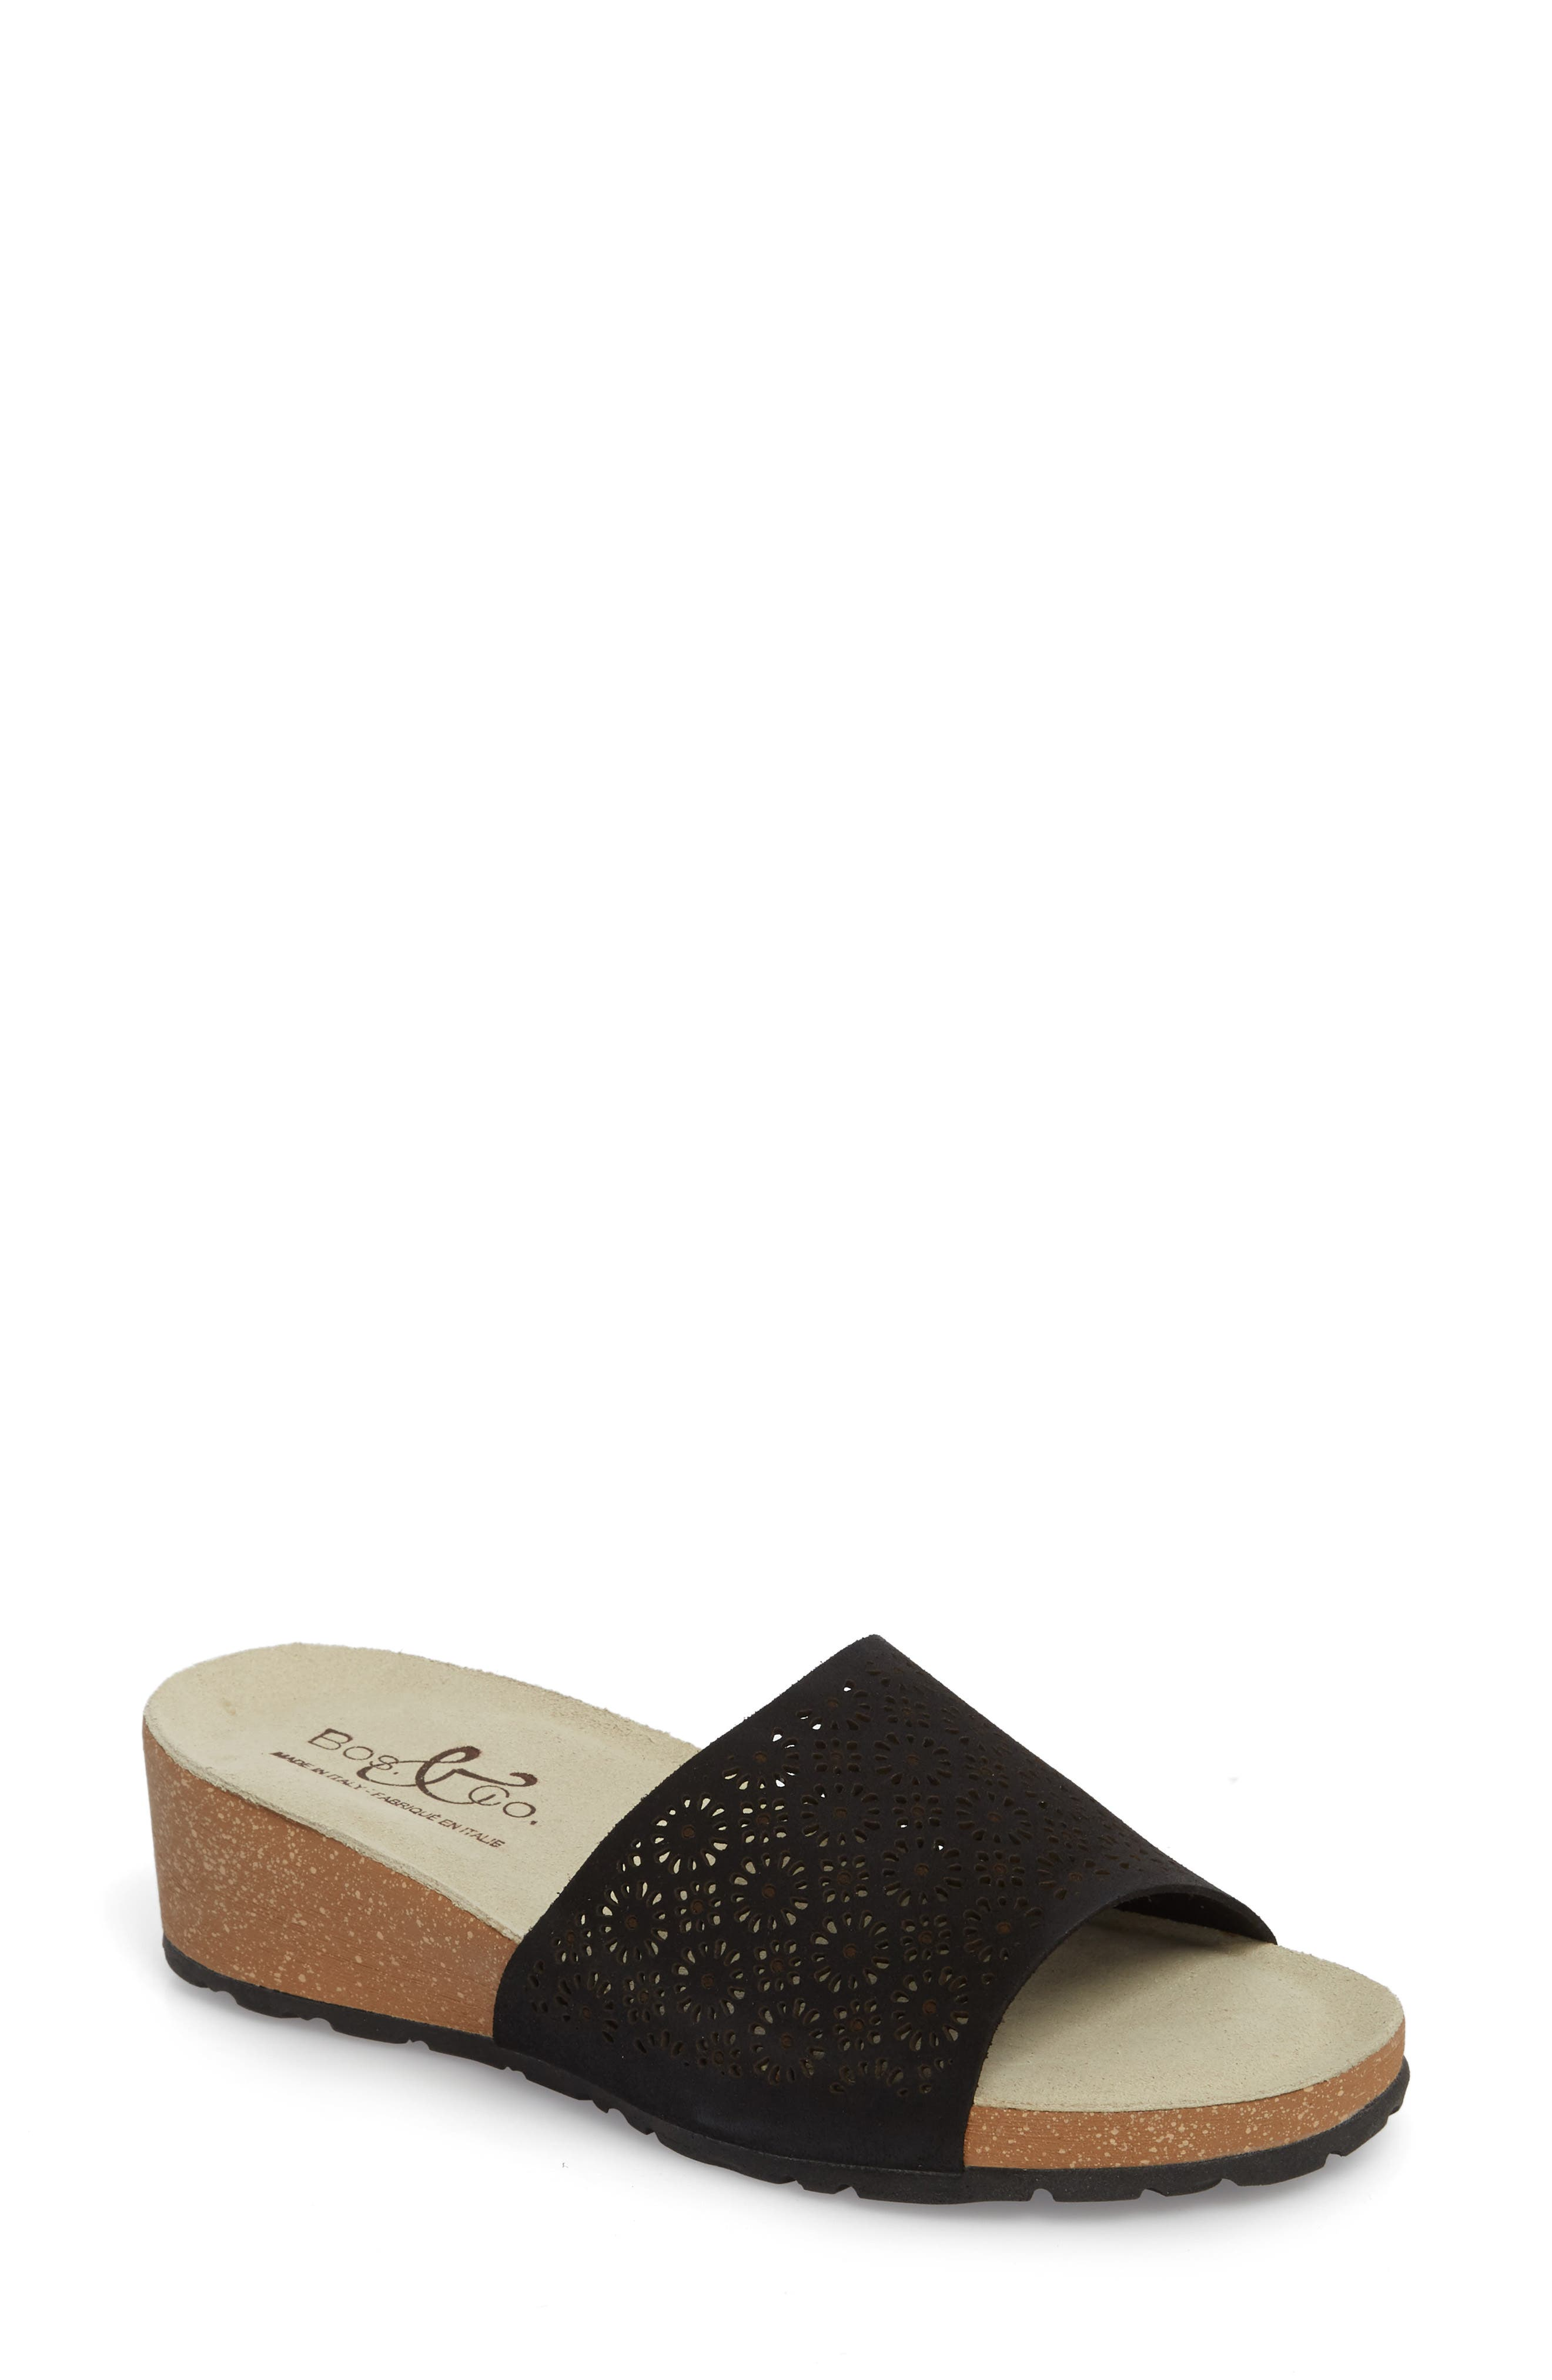 BOS. & CO. Loa Wedge Slide Sandal, Main, color, BLACK SUEDE